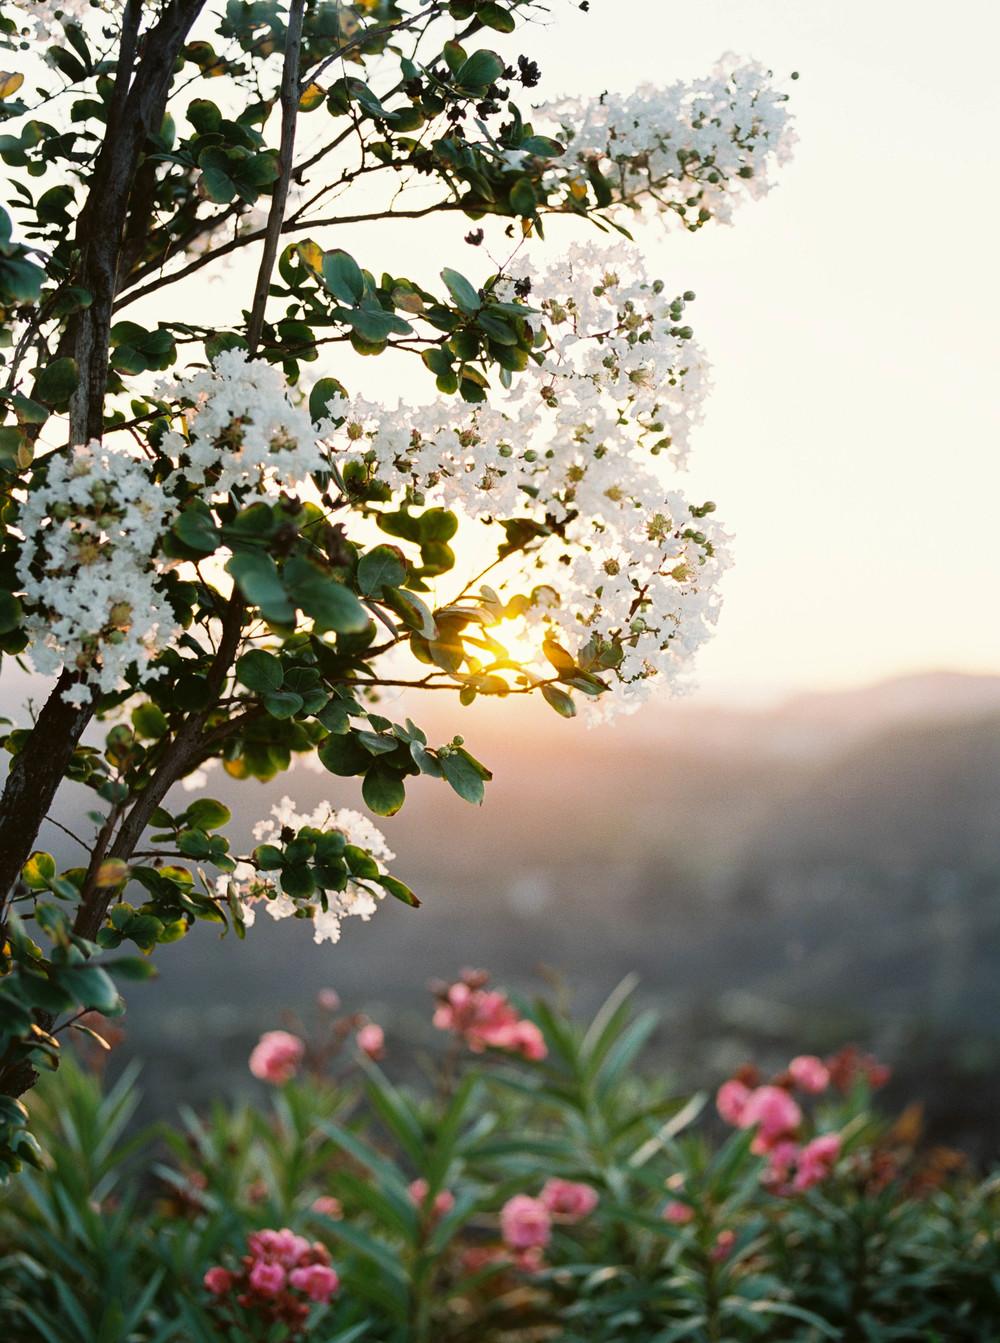 Alyssa Joy Photography - Los Angeles, CA travel photographer